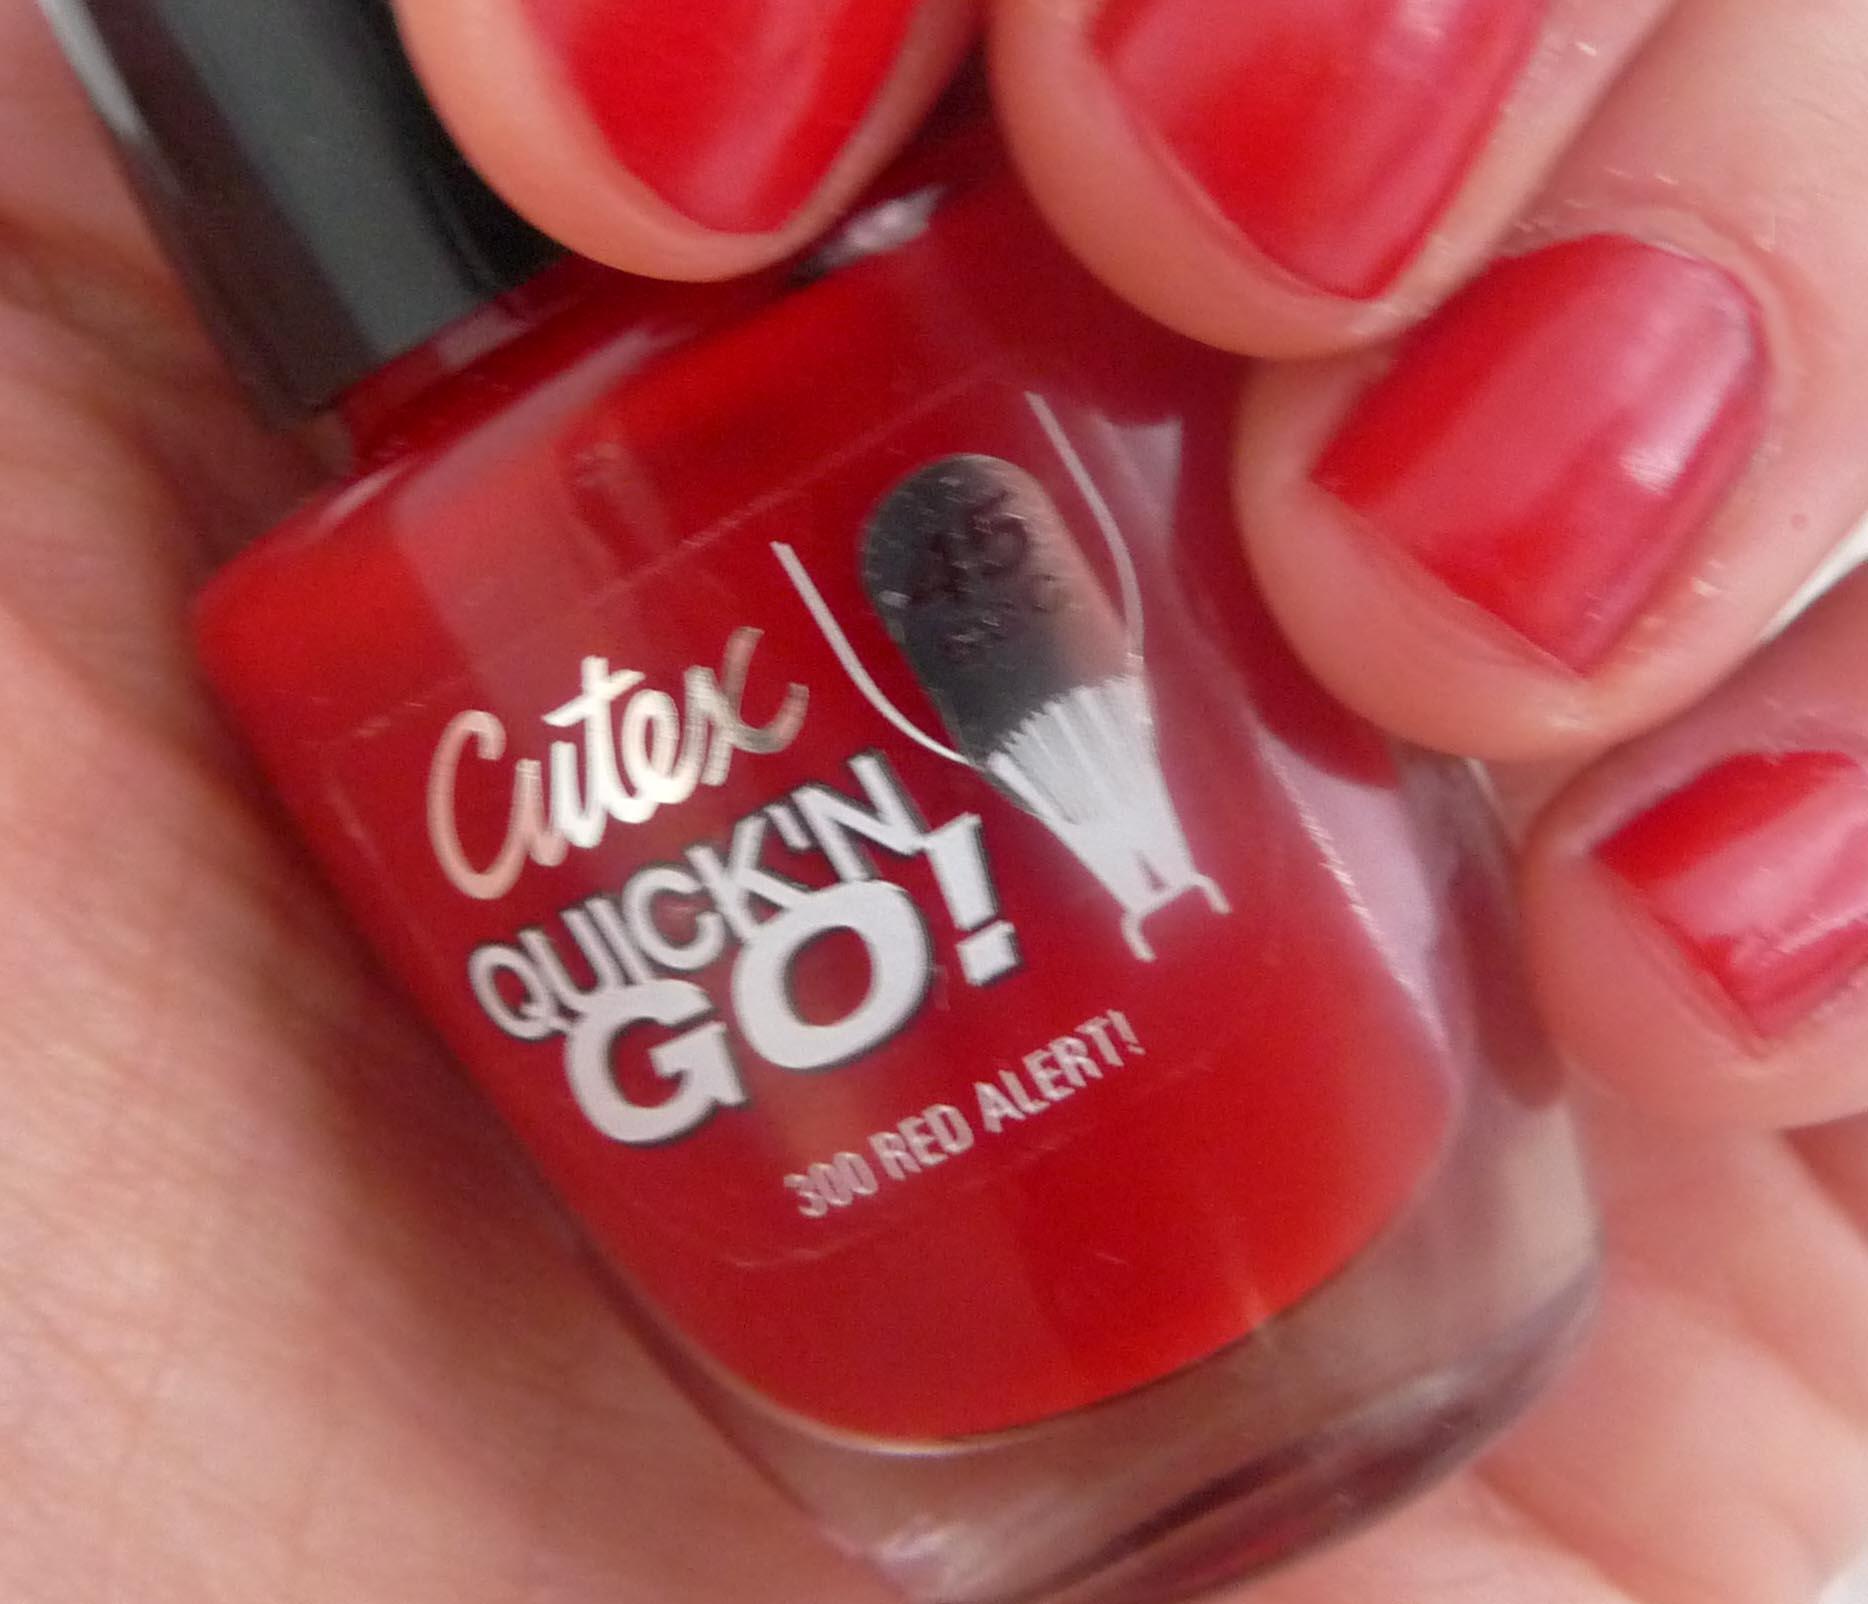 Love: Cutex Nail Polish | Sew Bake Love